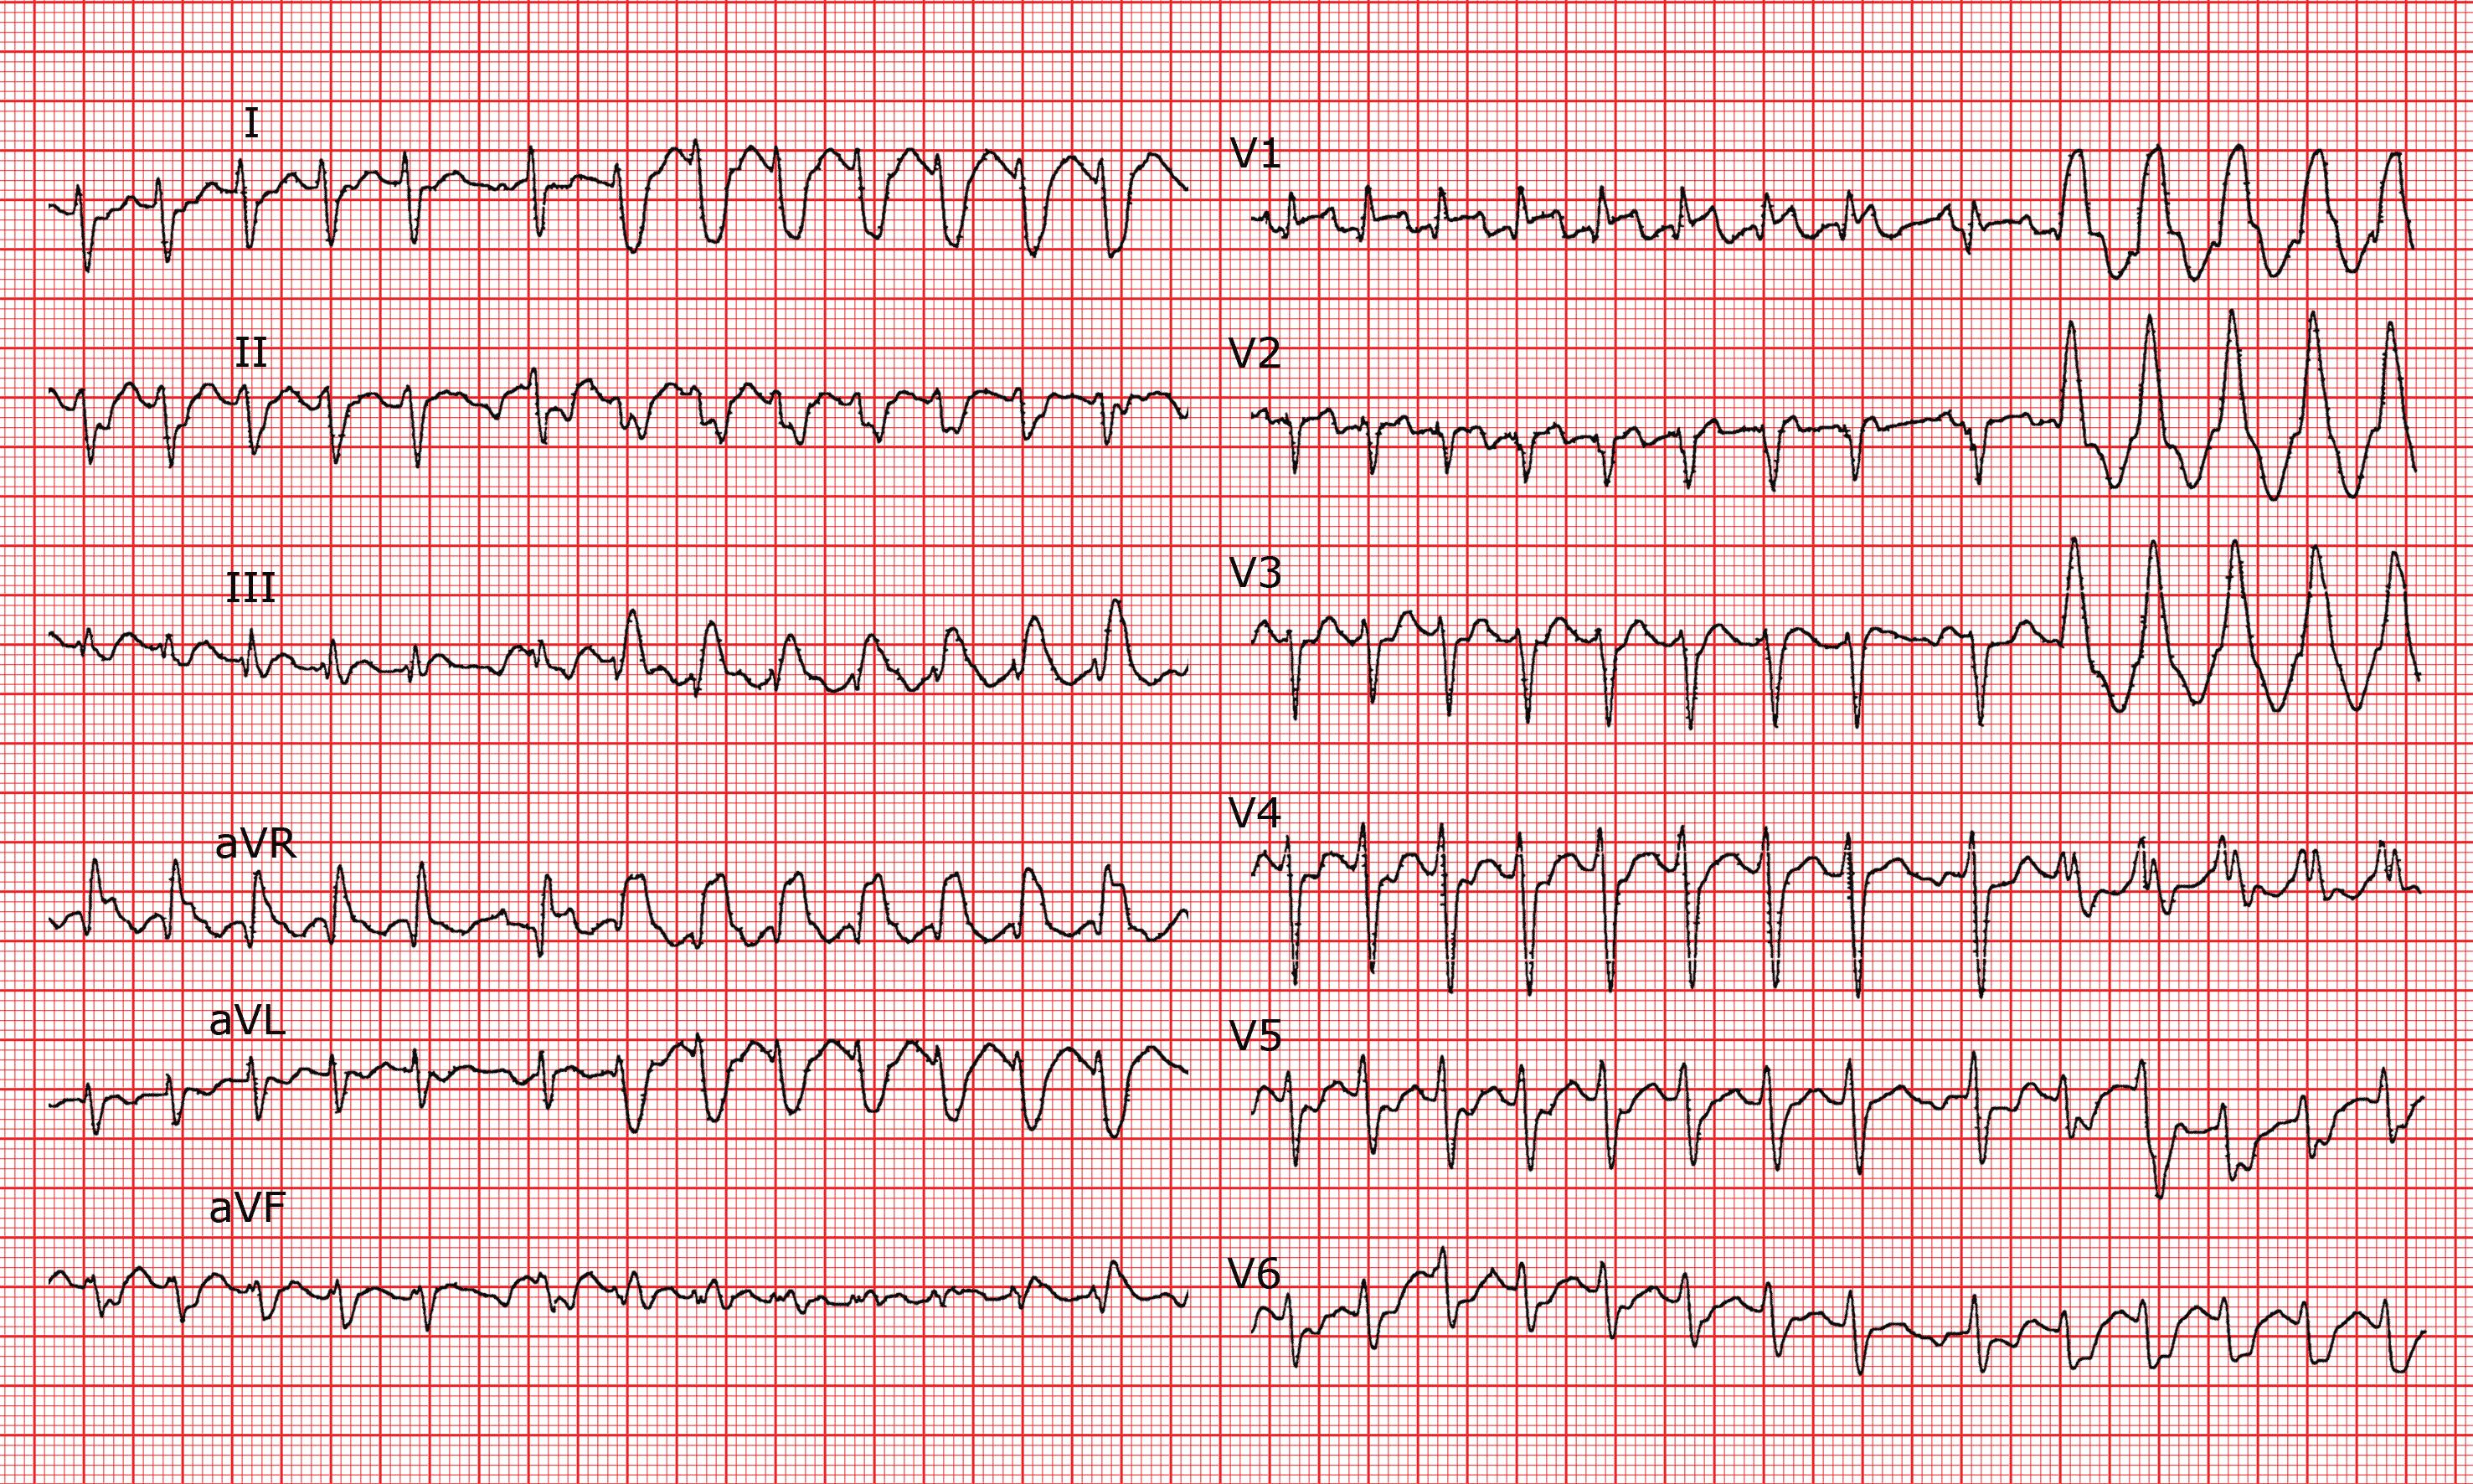 Cardio-FR — Fribourg's Cardiology Database